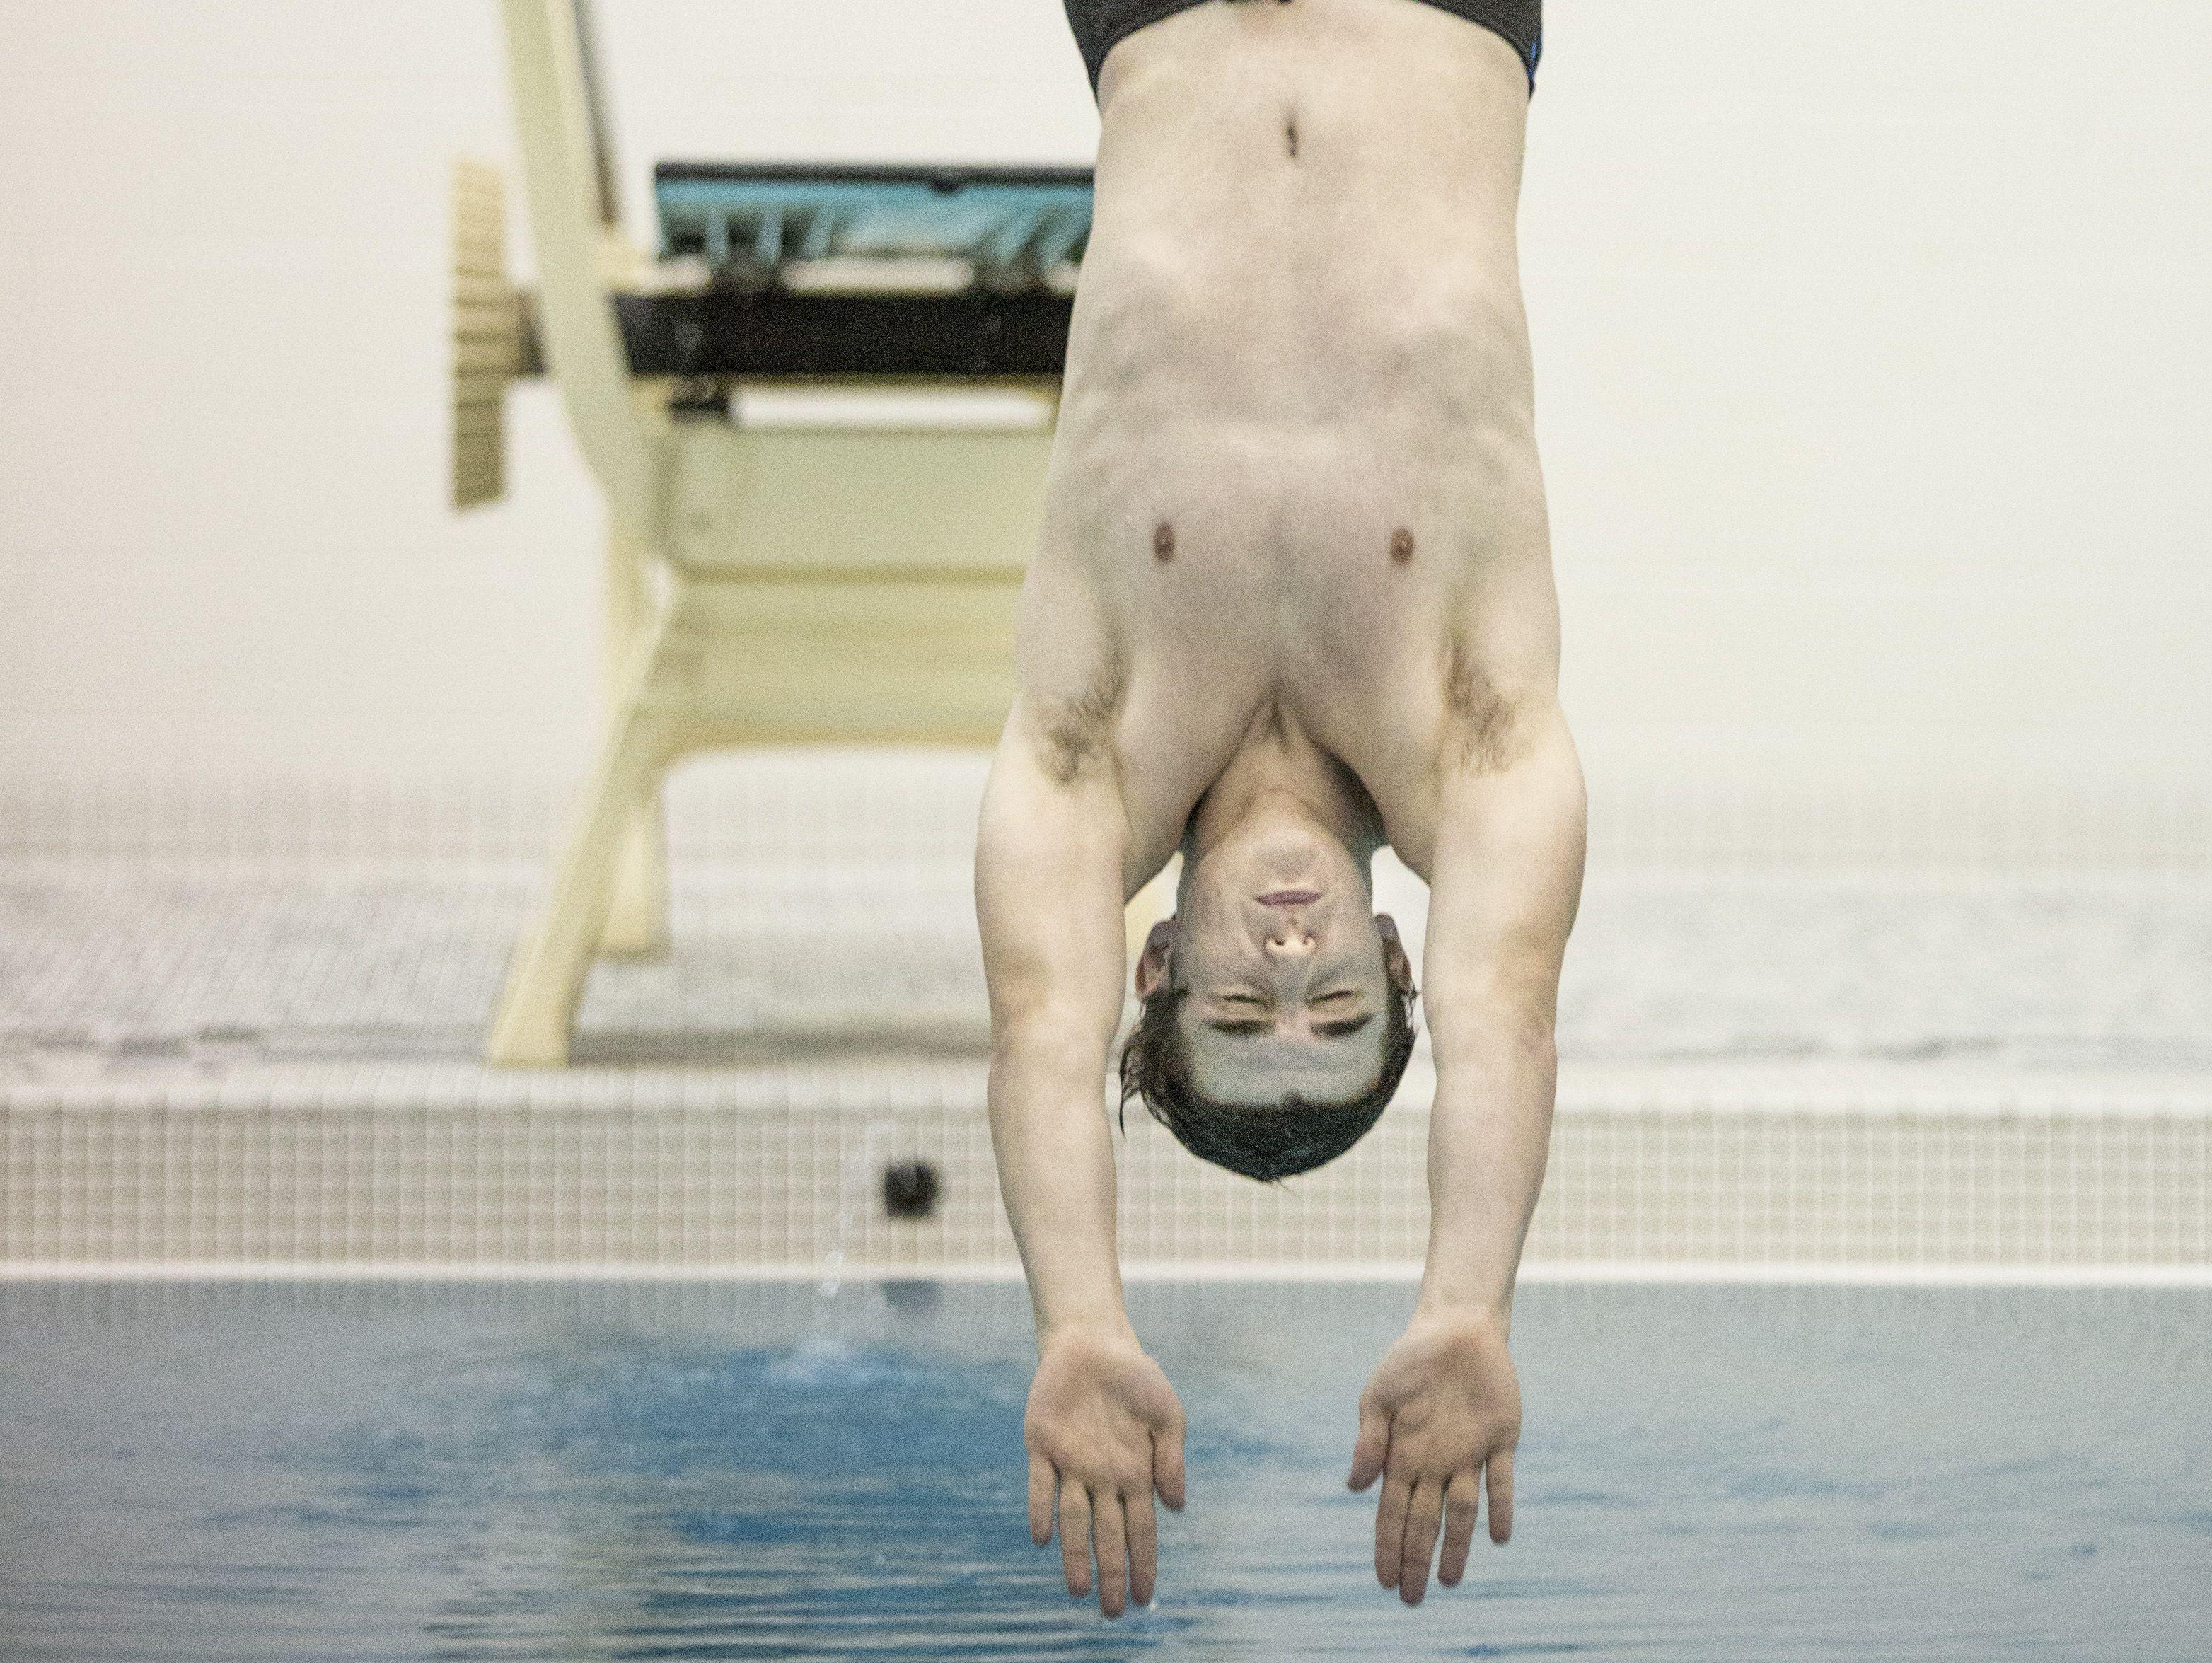 Marysville's Garrett McLane dives during a swim meet Tuesday, Feb. 9, 2016 at Marysville High School.